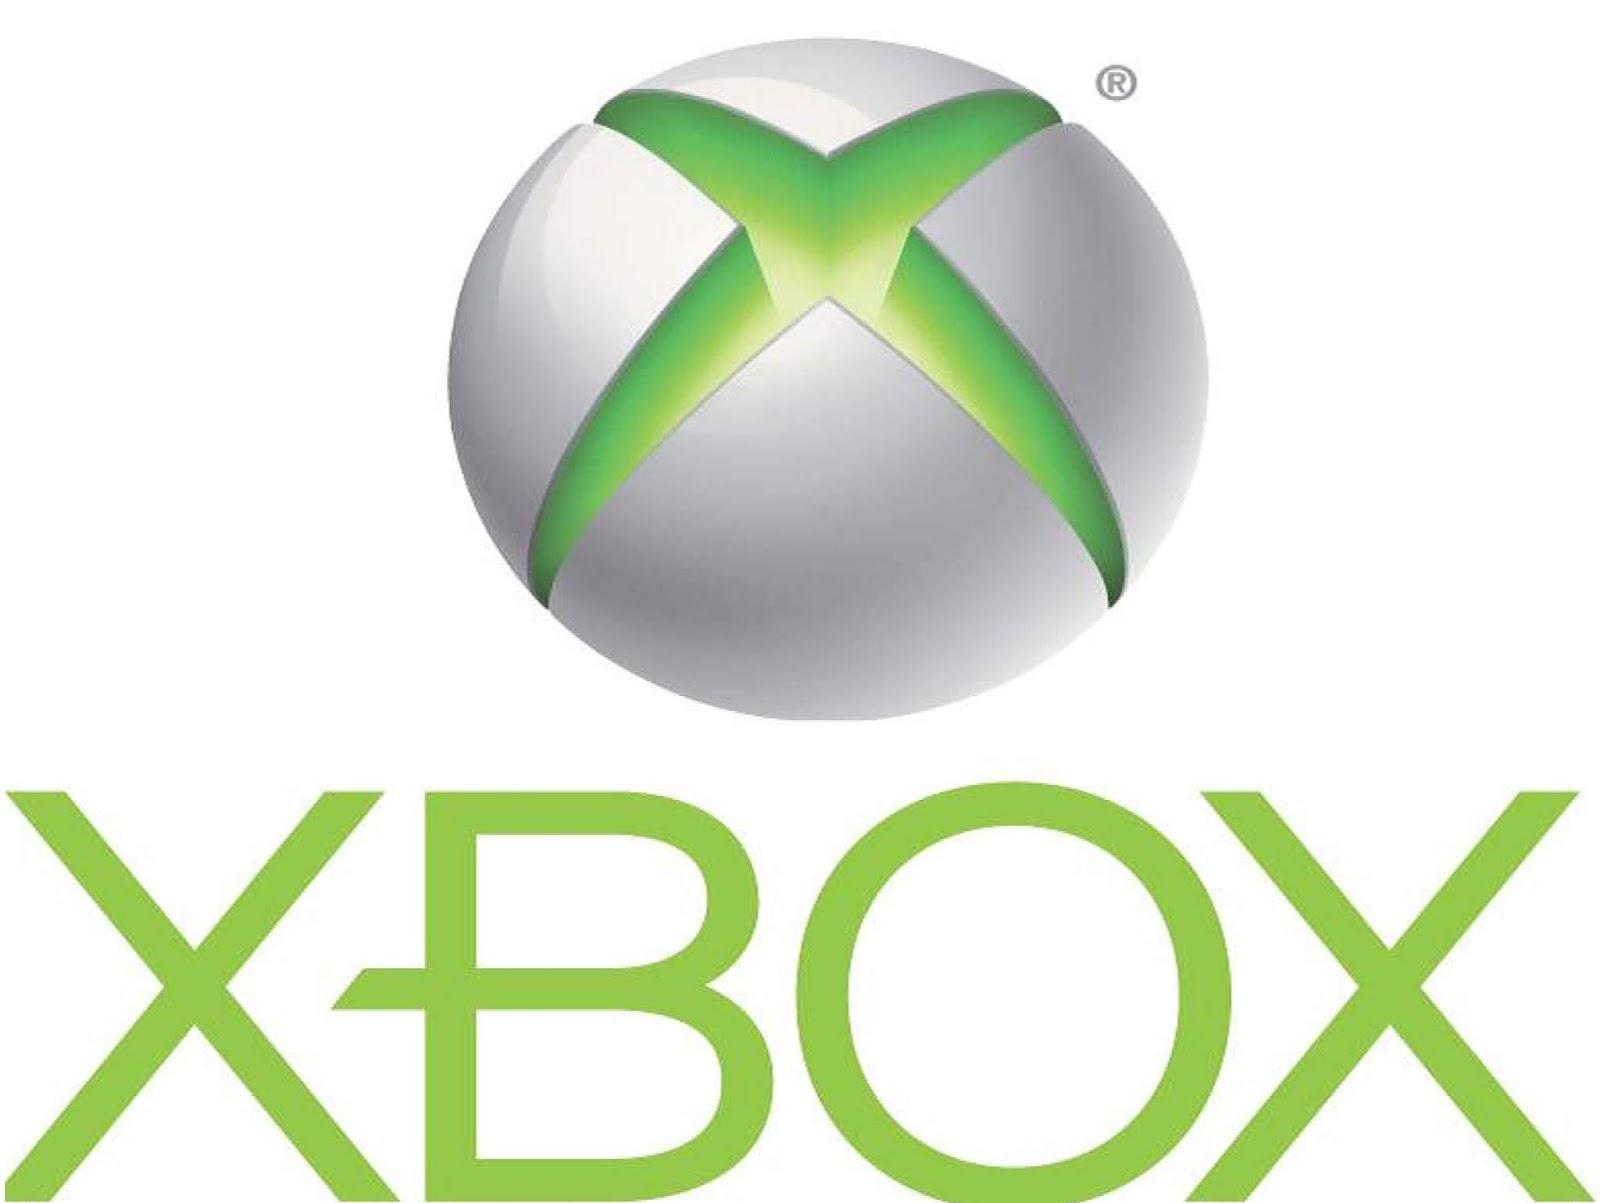 Upcoming Xbox Elite Controller V2